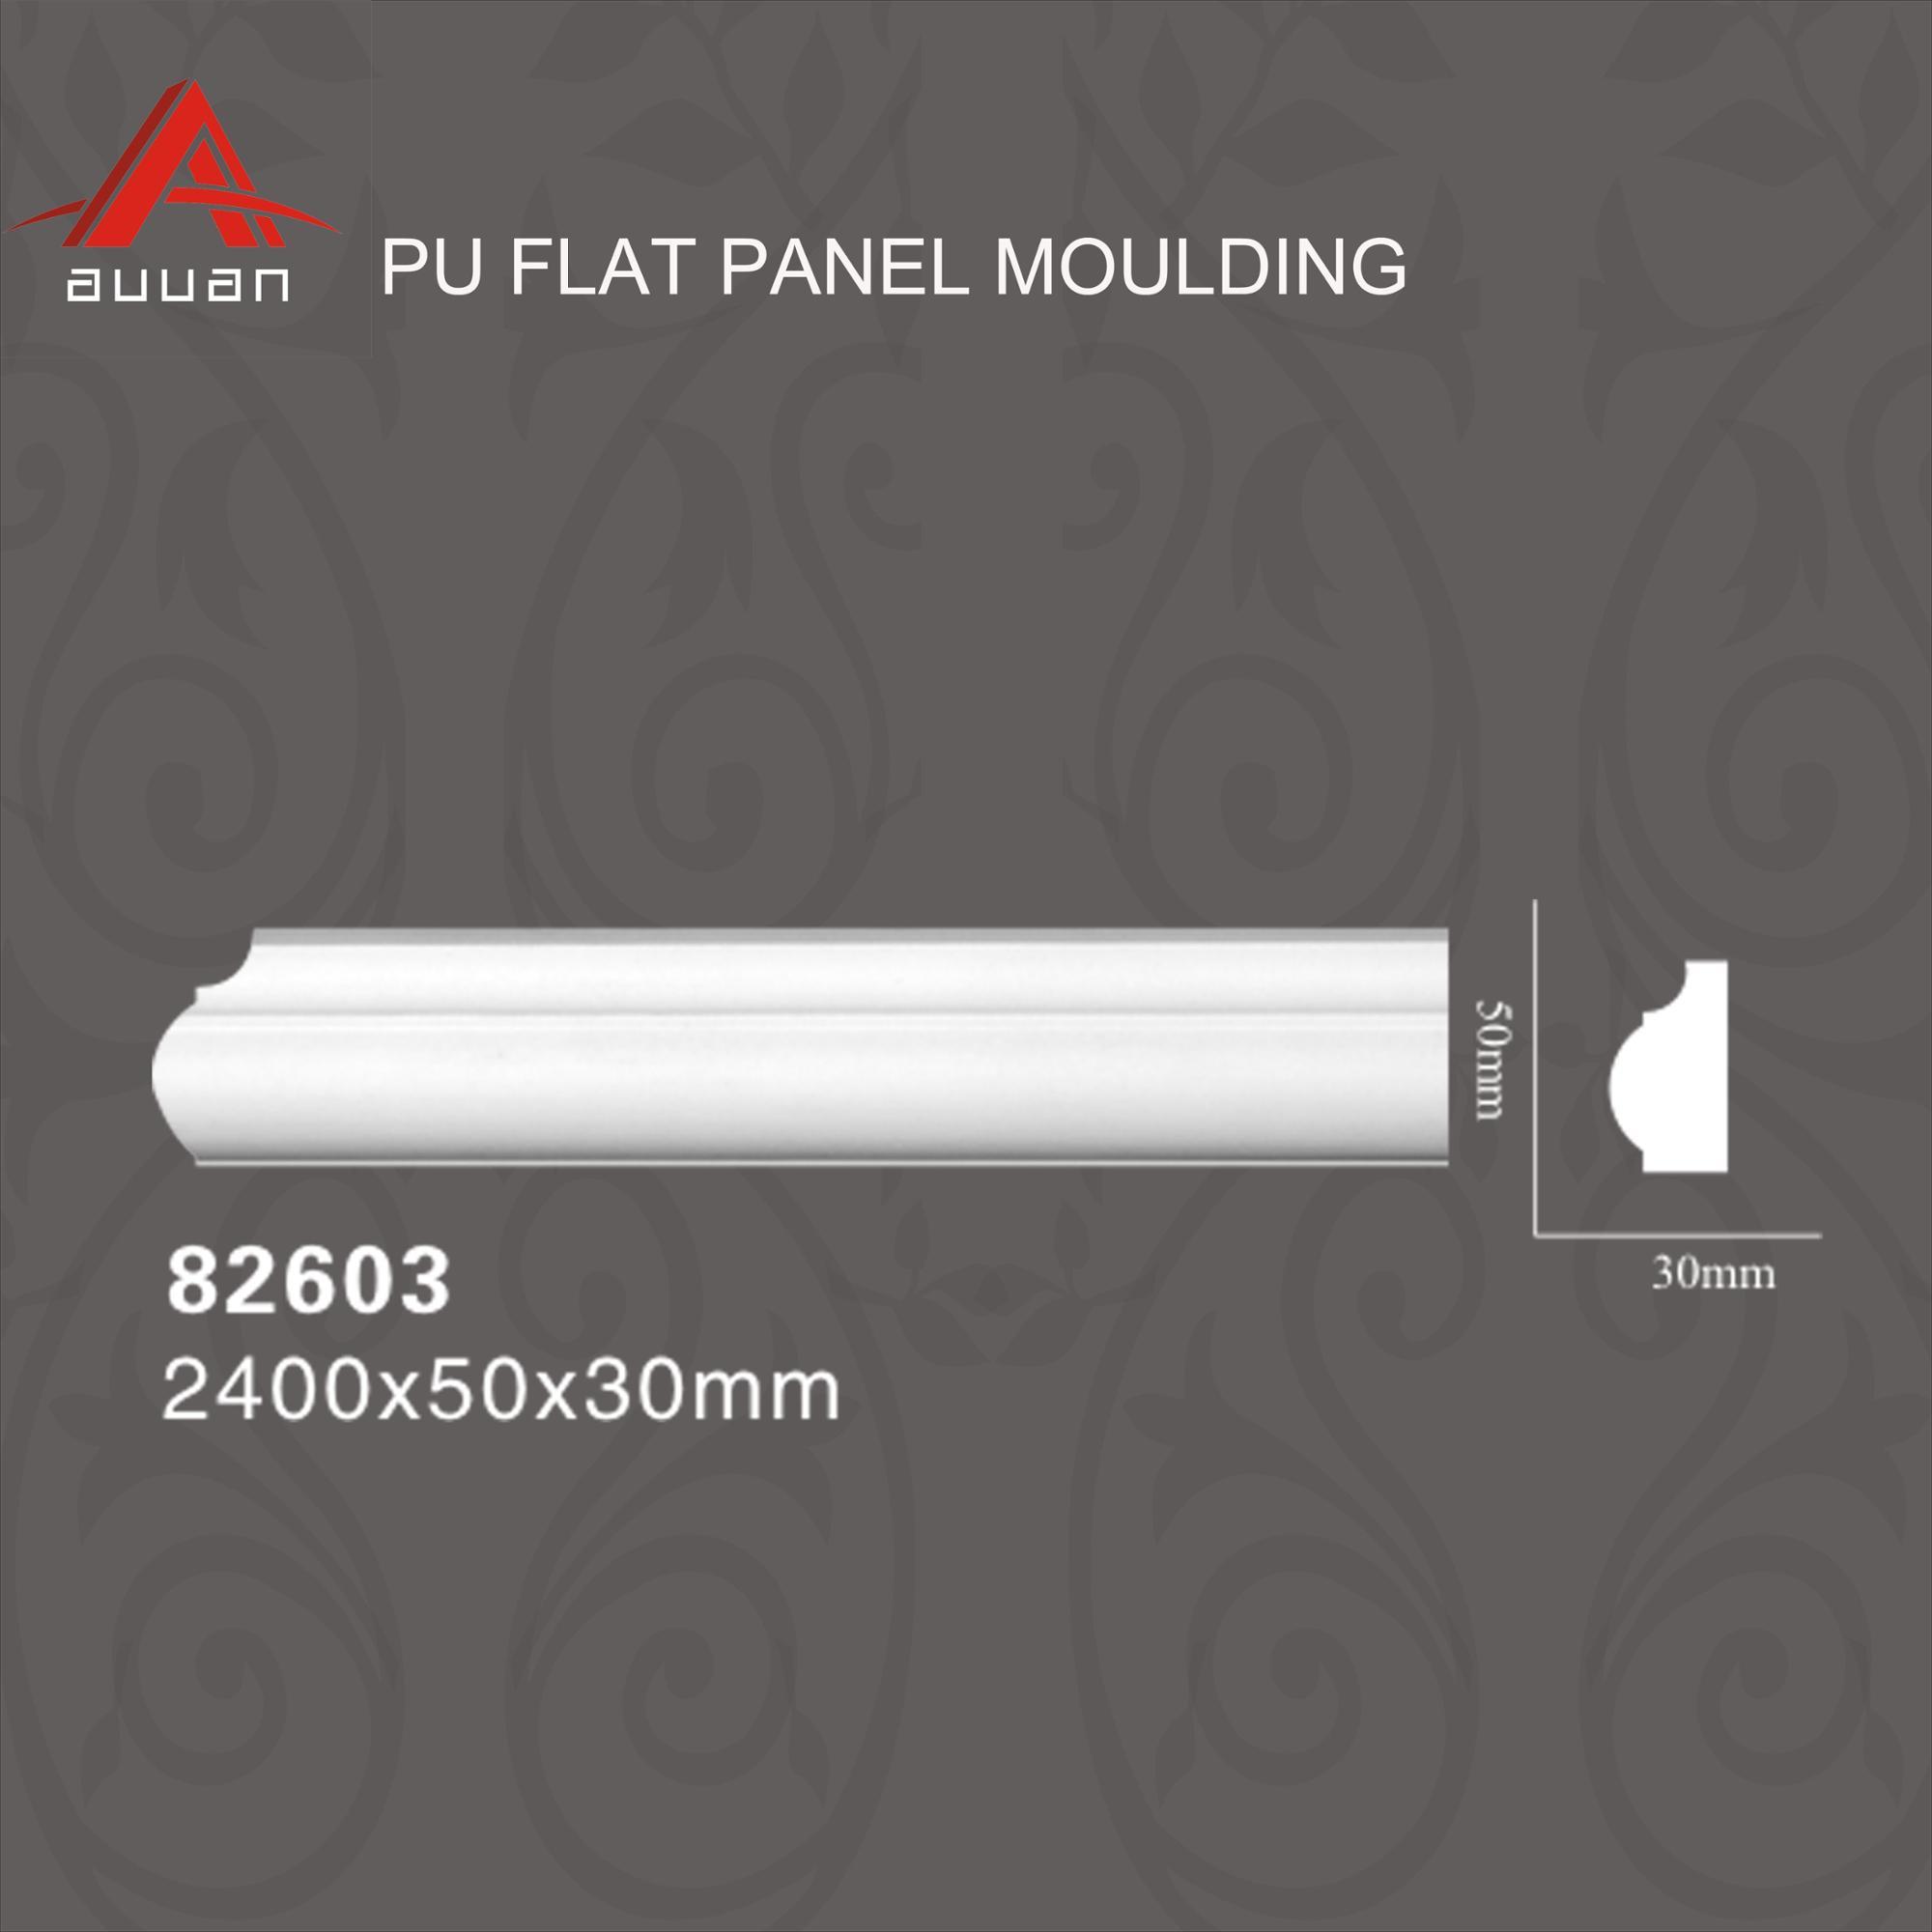 China pu architectural moulding wholesale 🇨🇳 - Alibaba